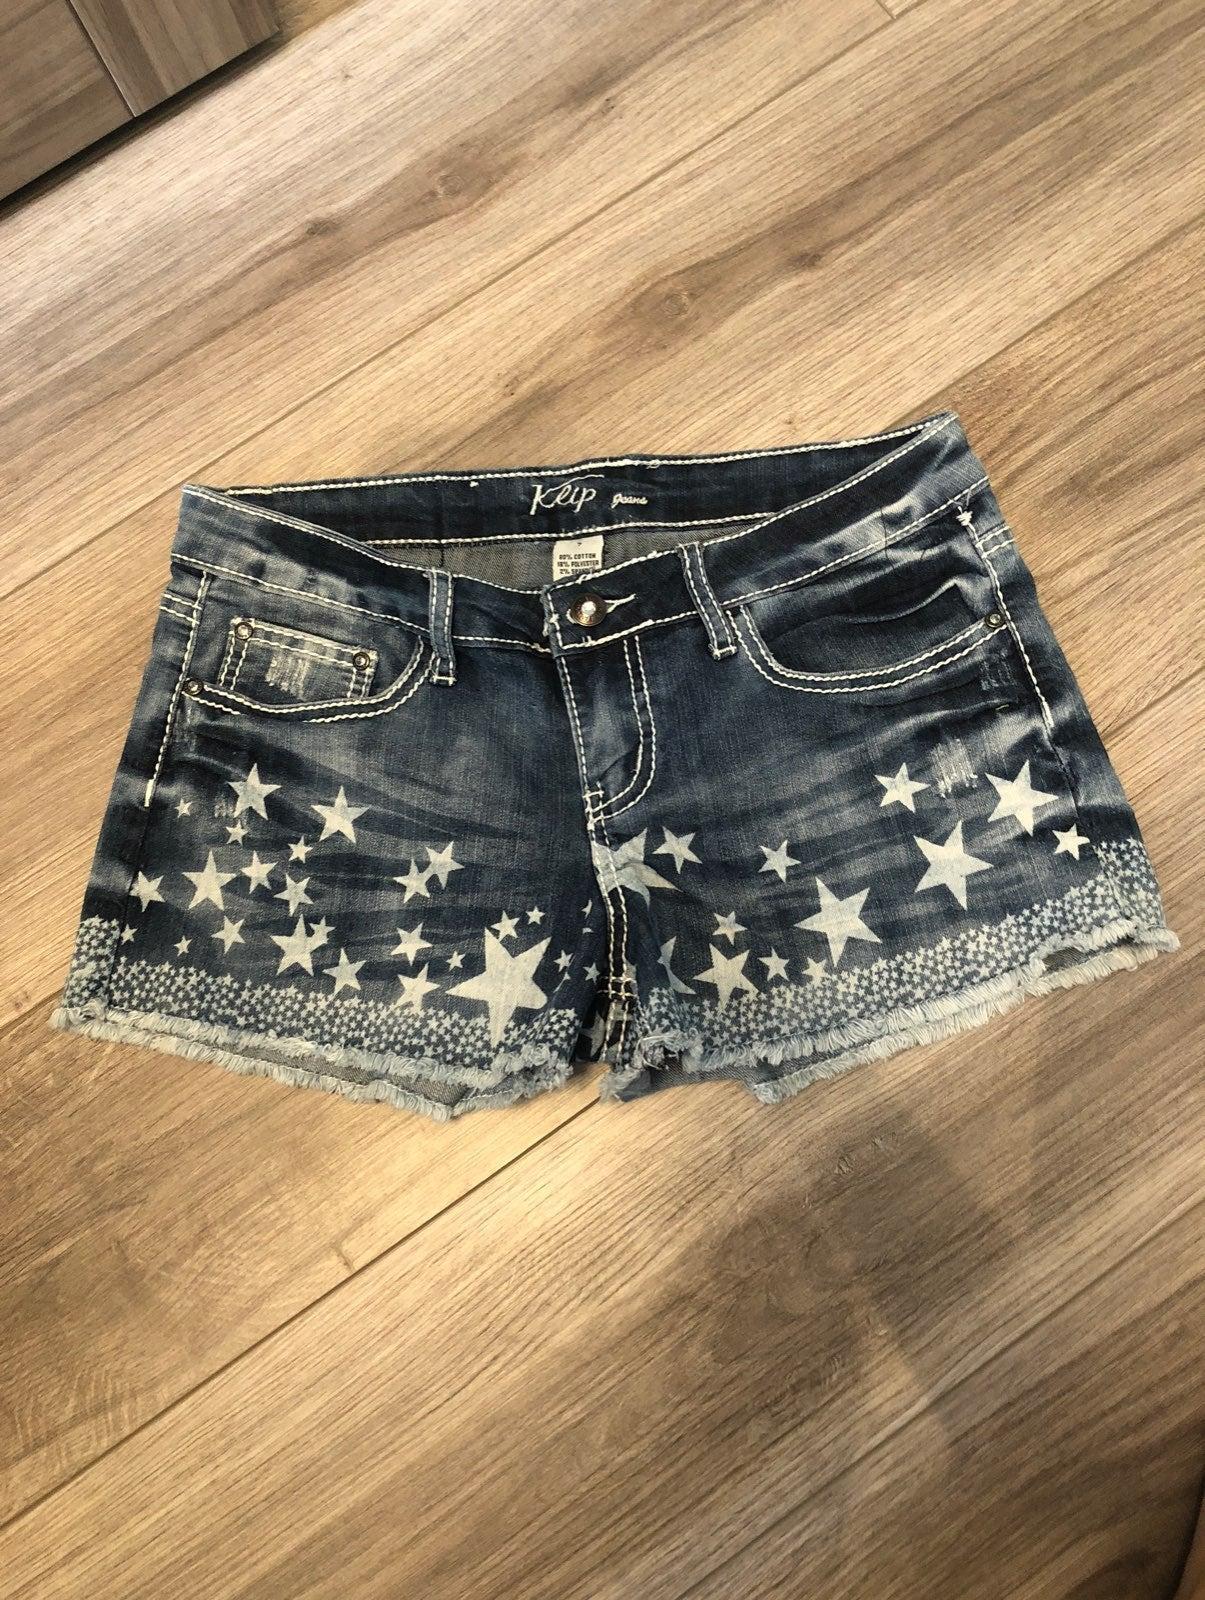 Juniors jean shorts - size 7